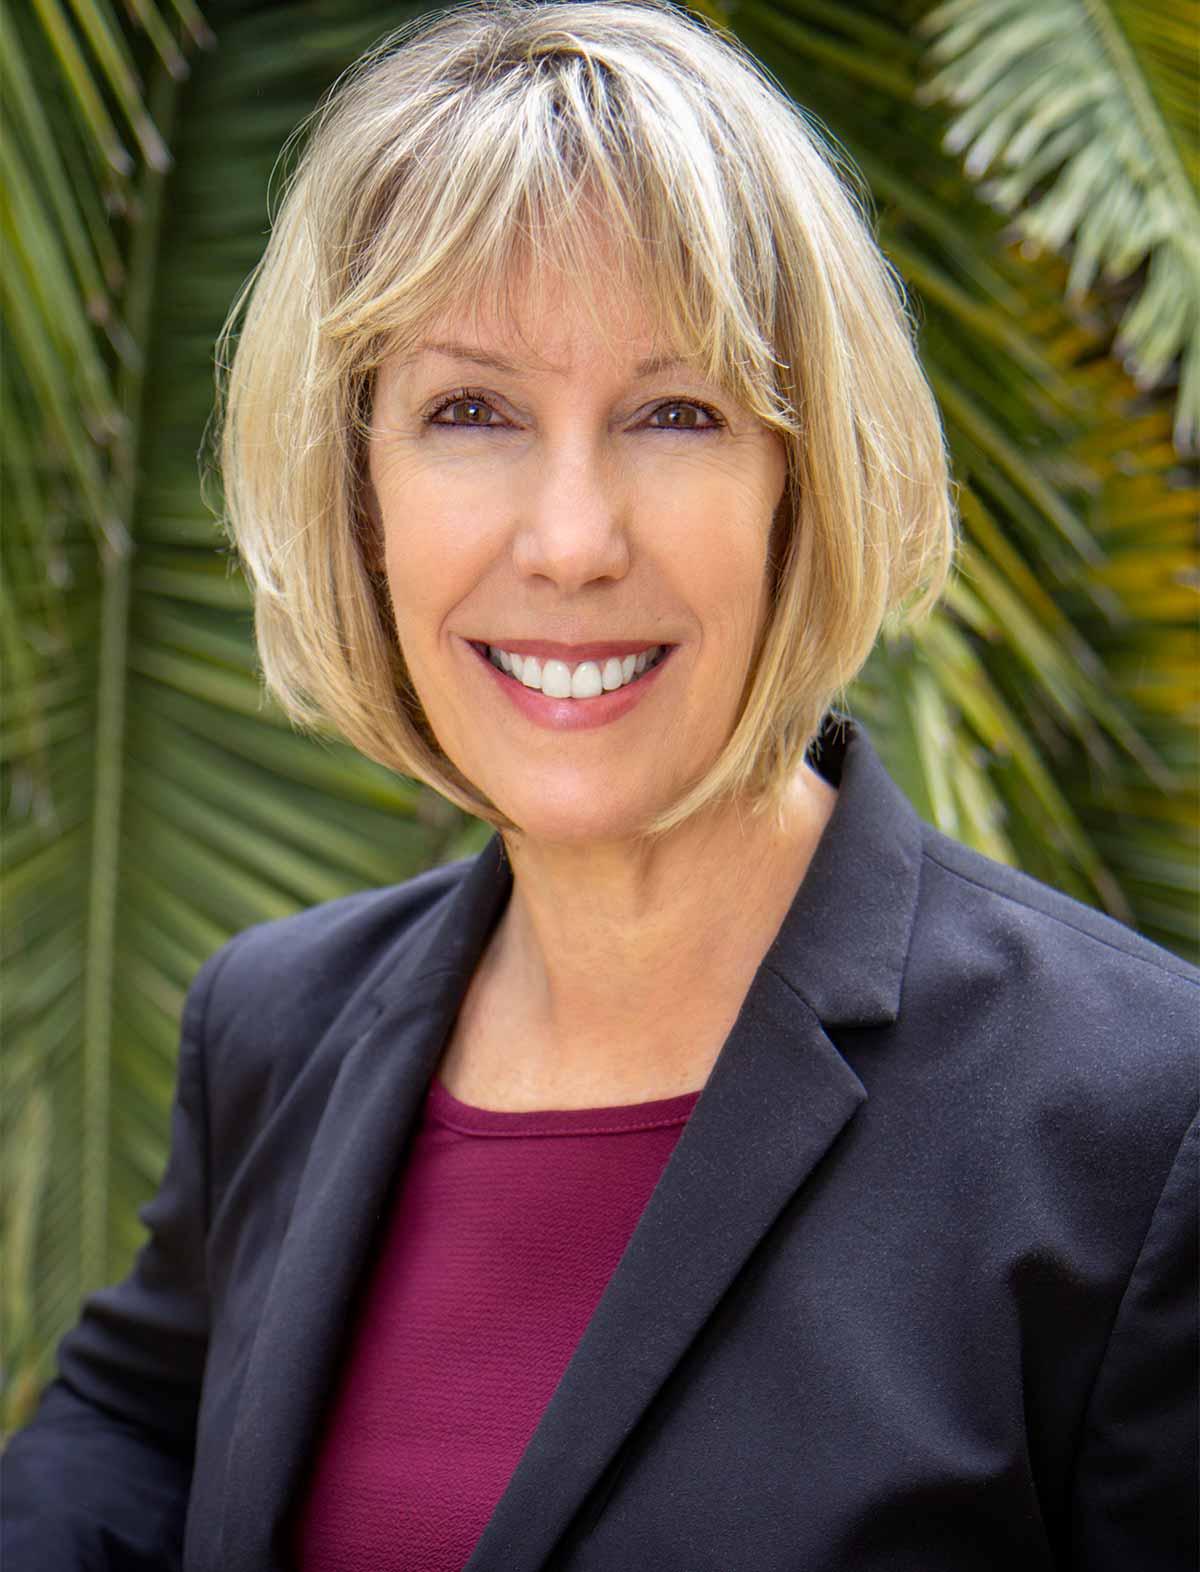 Susan Polk Insurance San Luis Obispo headshot Laurie